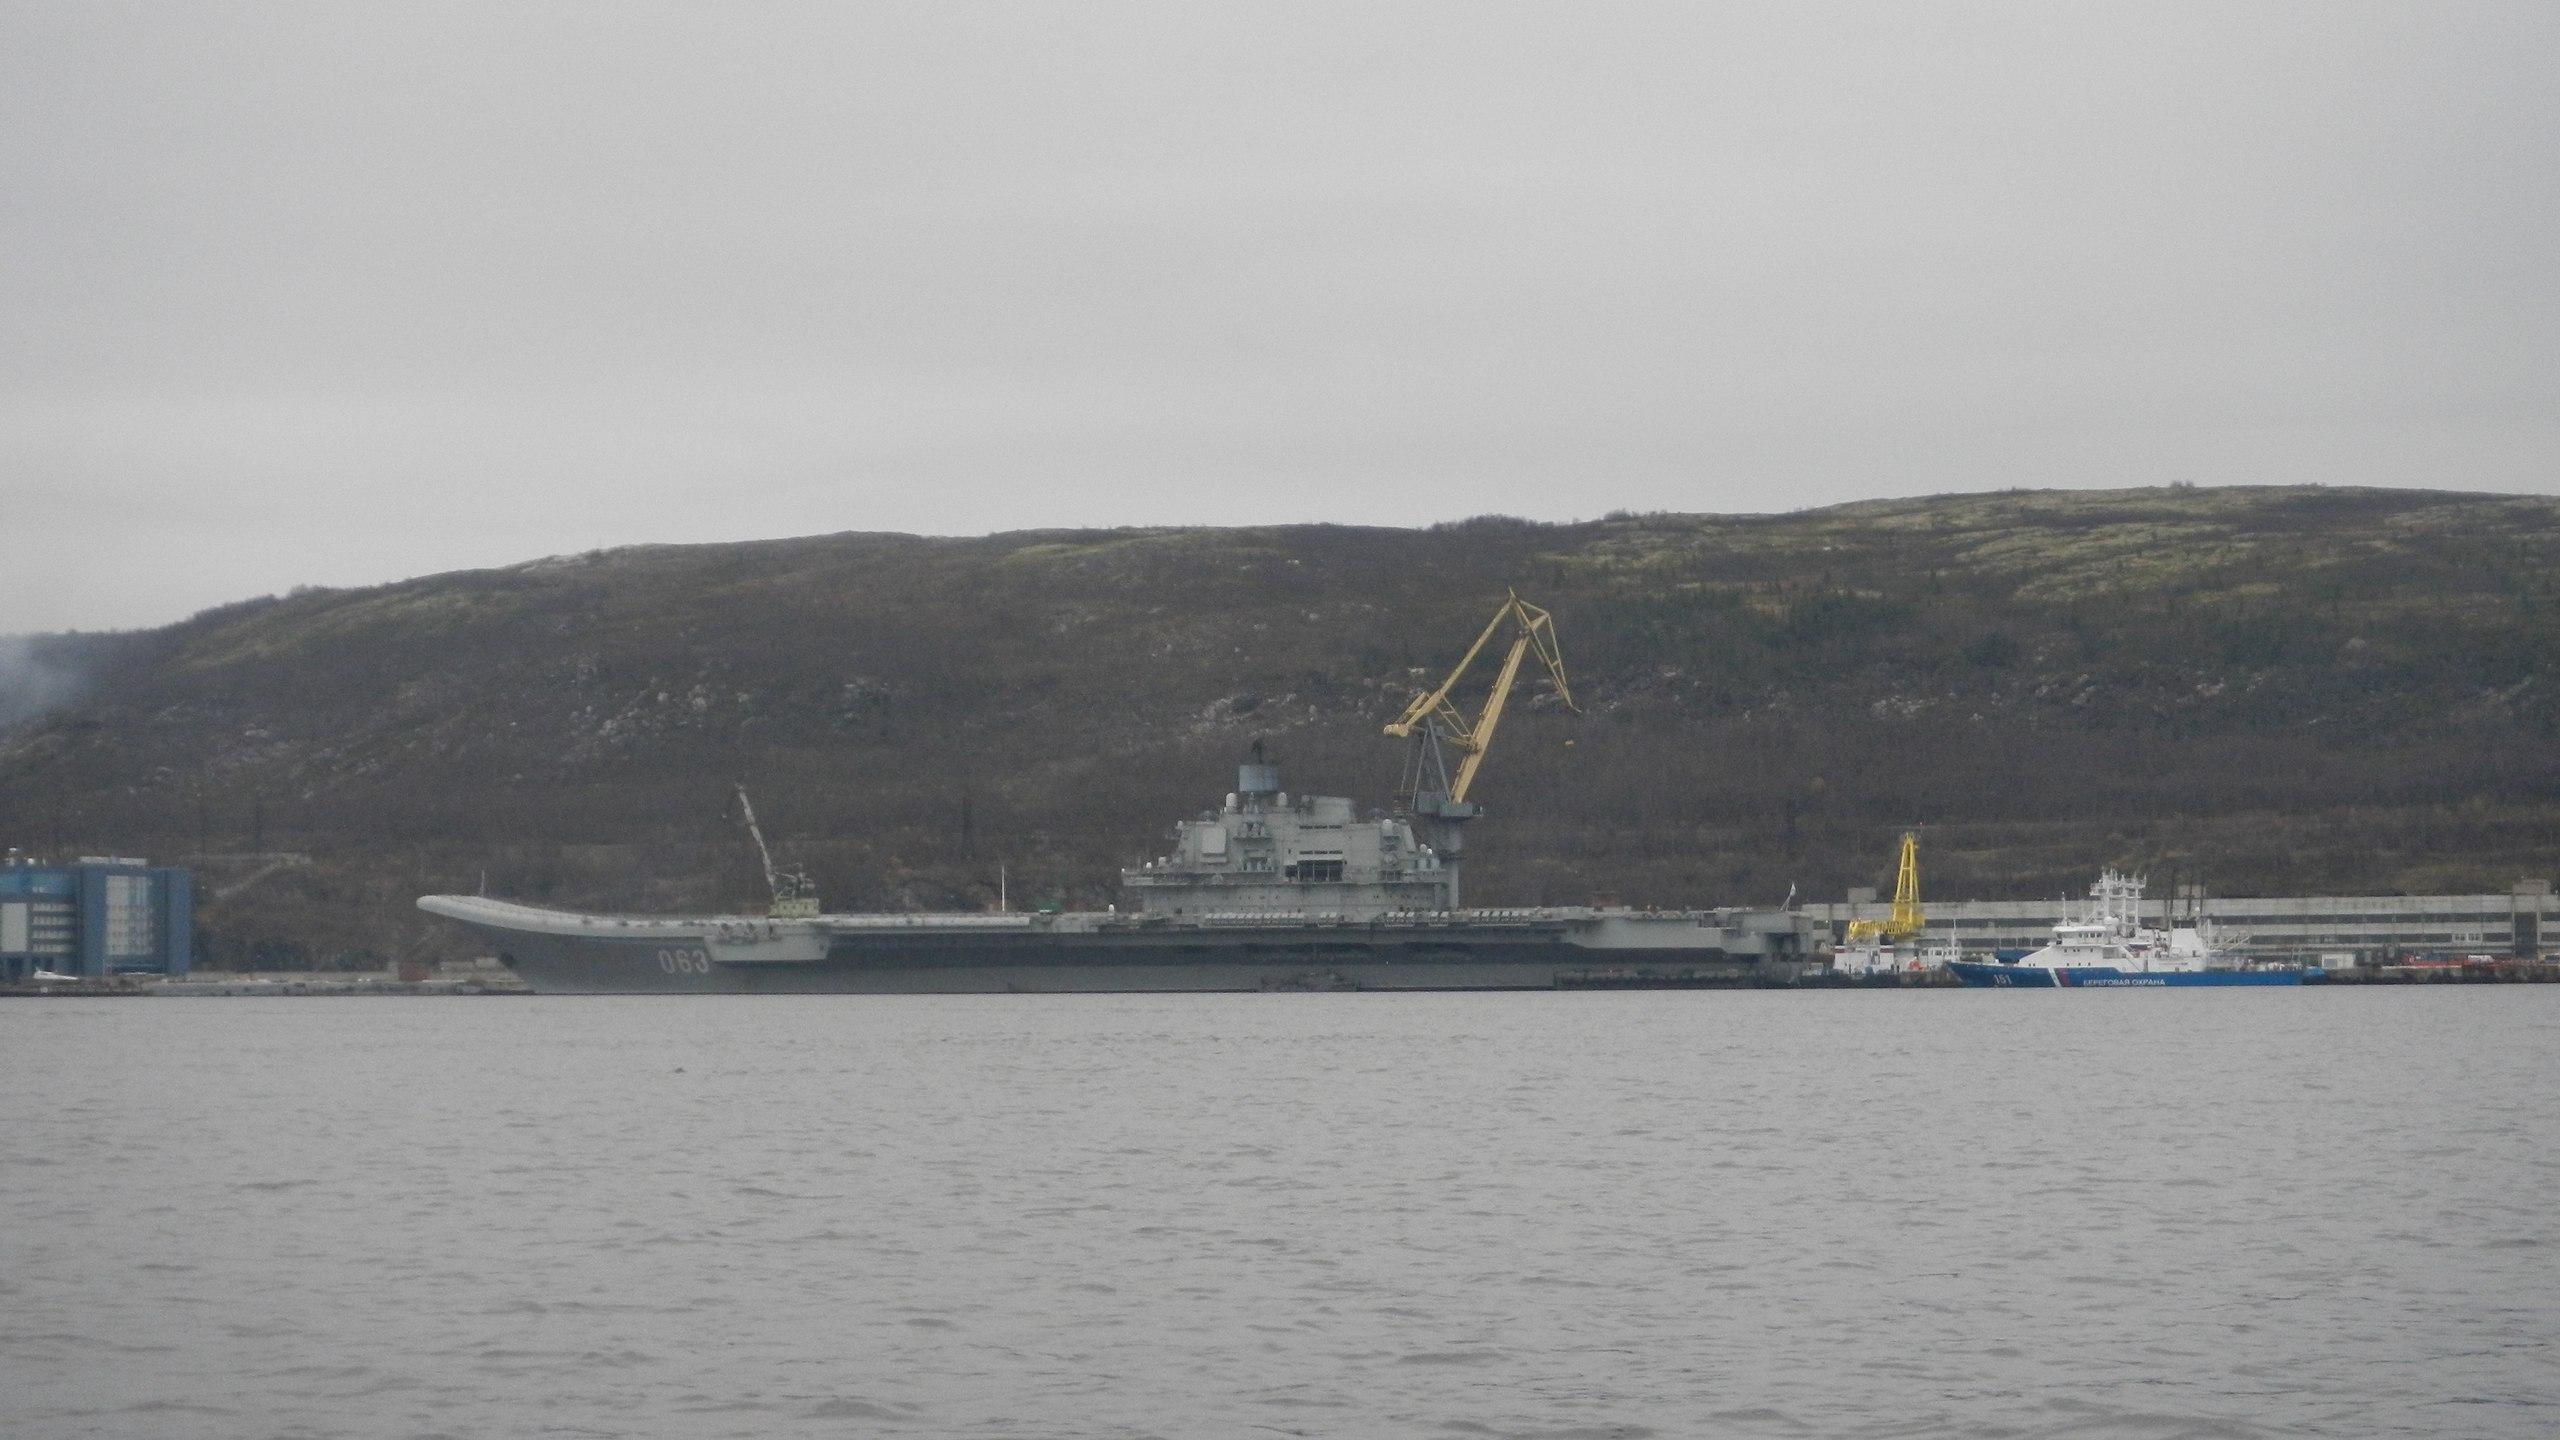 Orosz hadiflotta EY74VFJ41WU